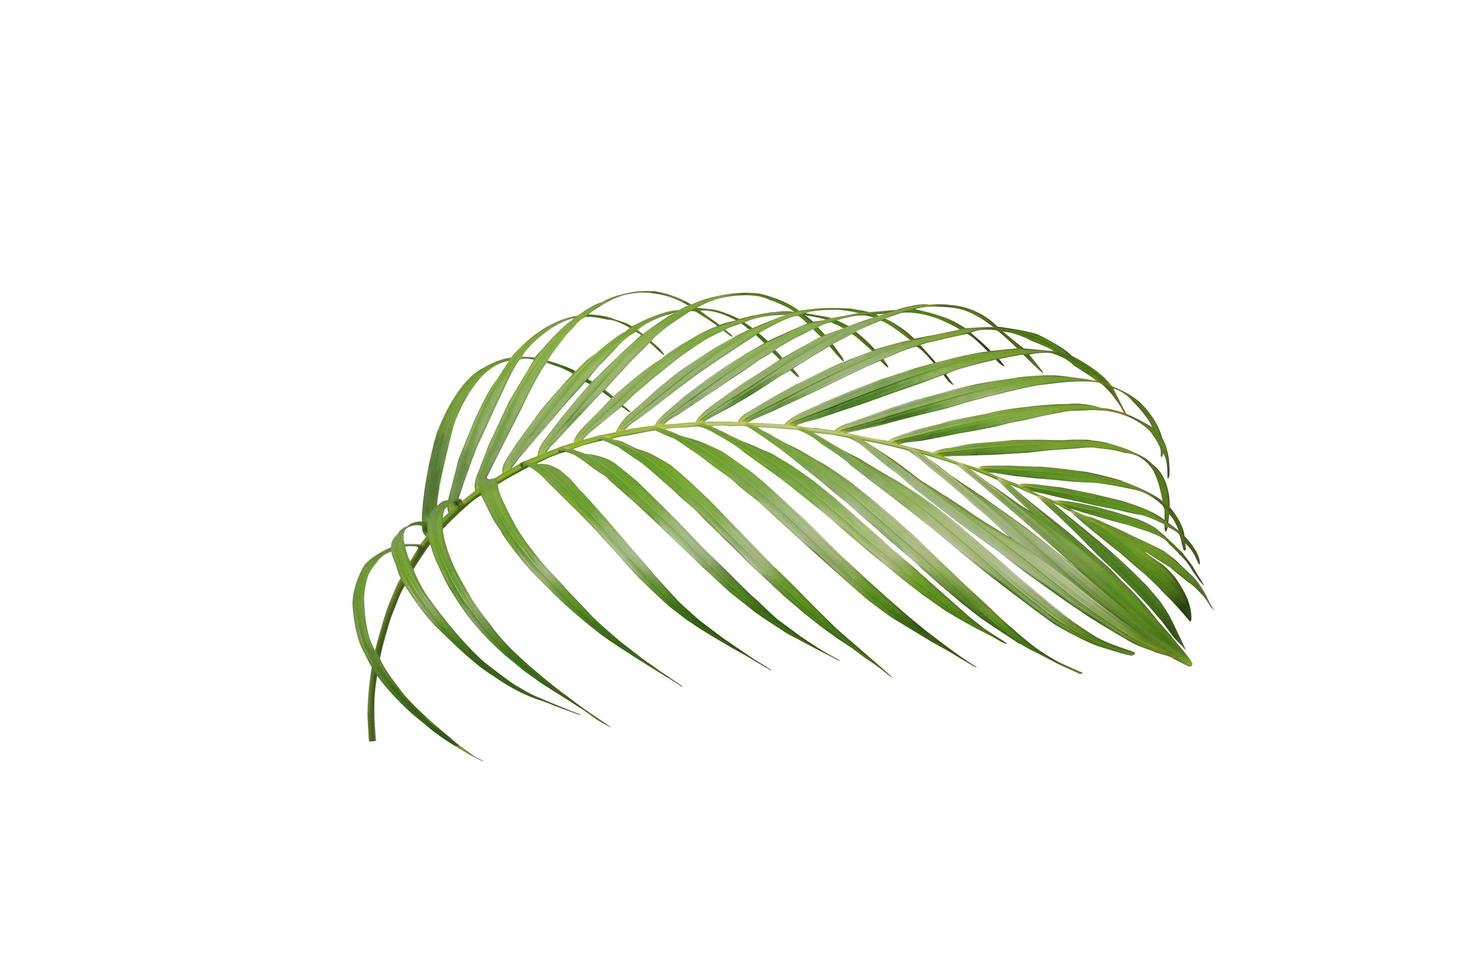 Lush palm tree leaf photo